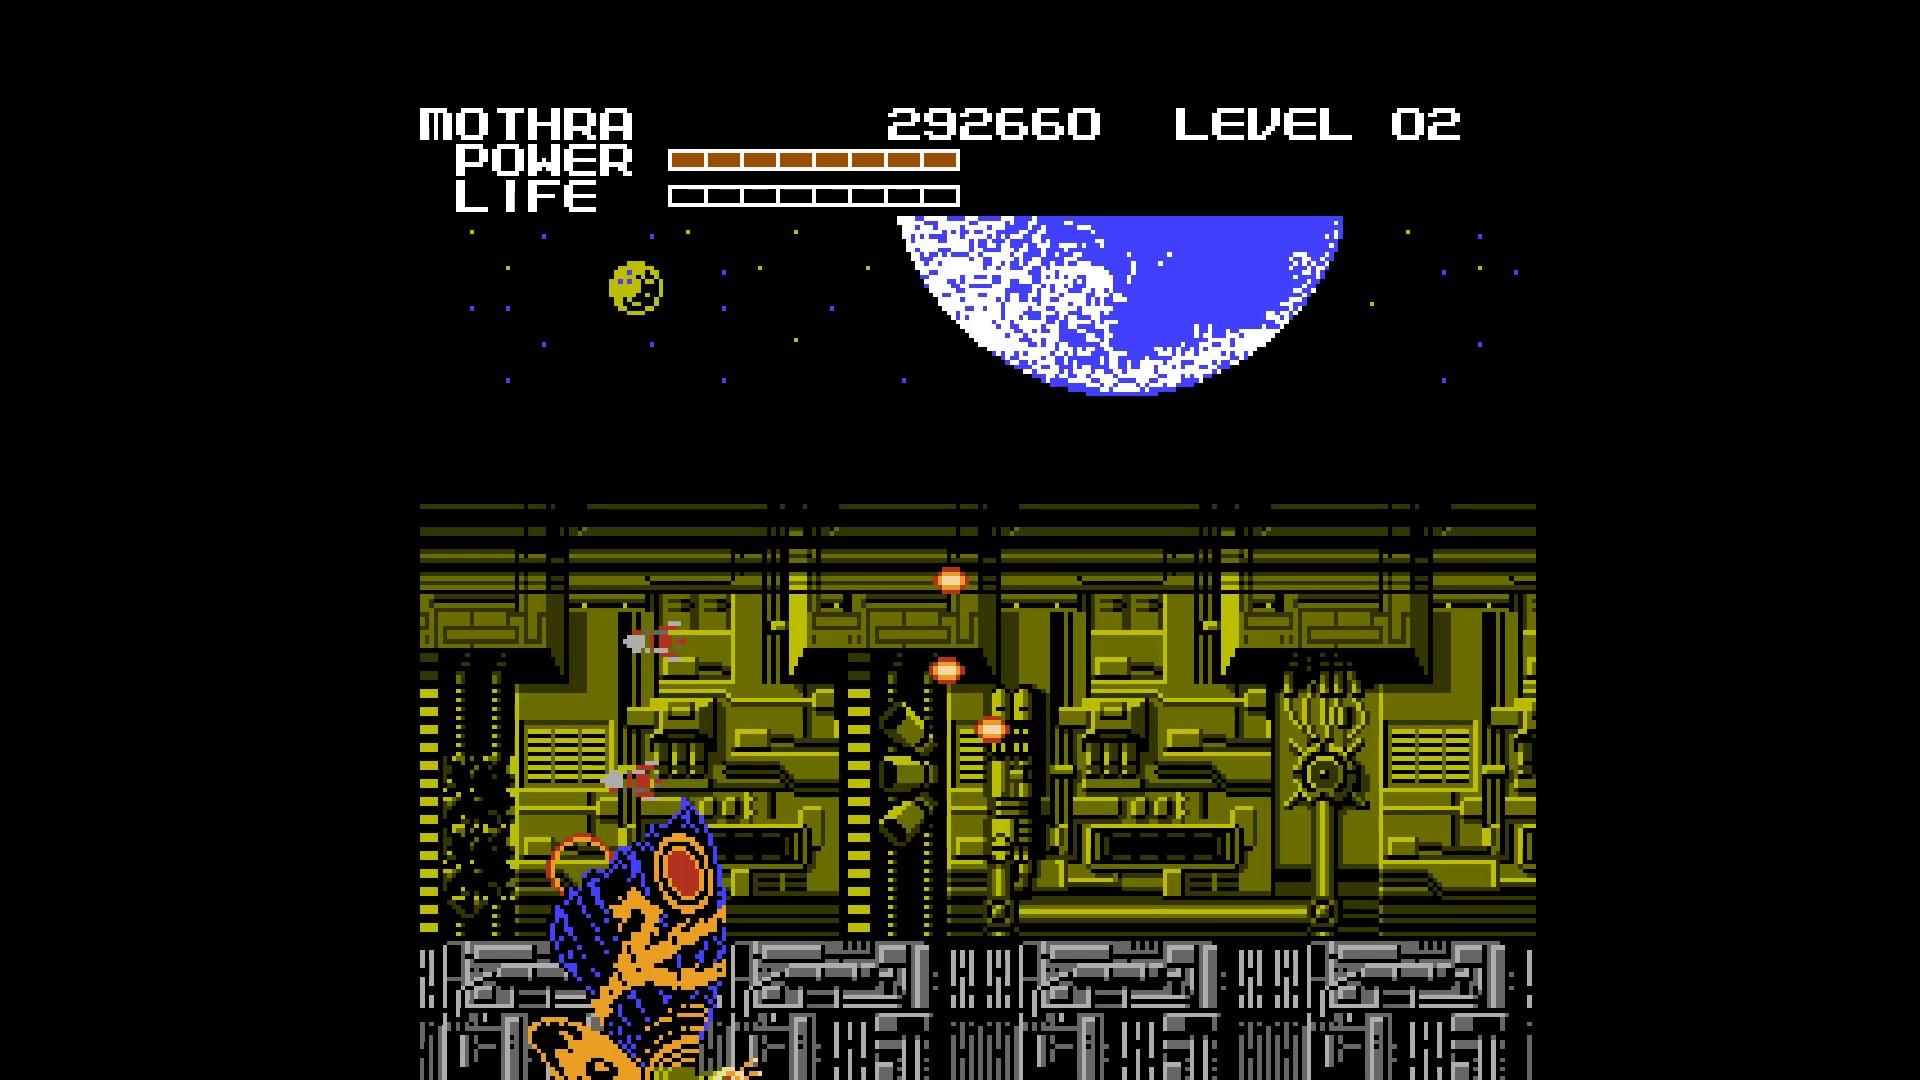 AkinNahtanoj: Godzilla: Monster of Monsters! (NES/Famicom Emulated) 292,660 points on 2020-10-25 04:53:11